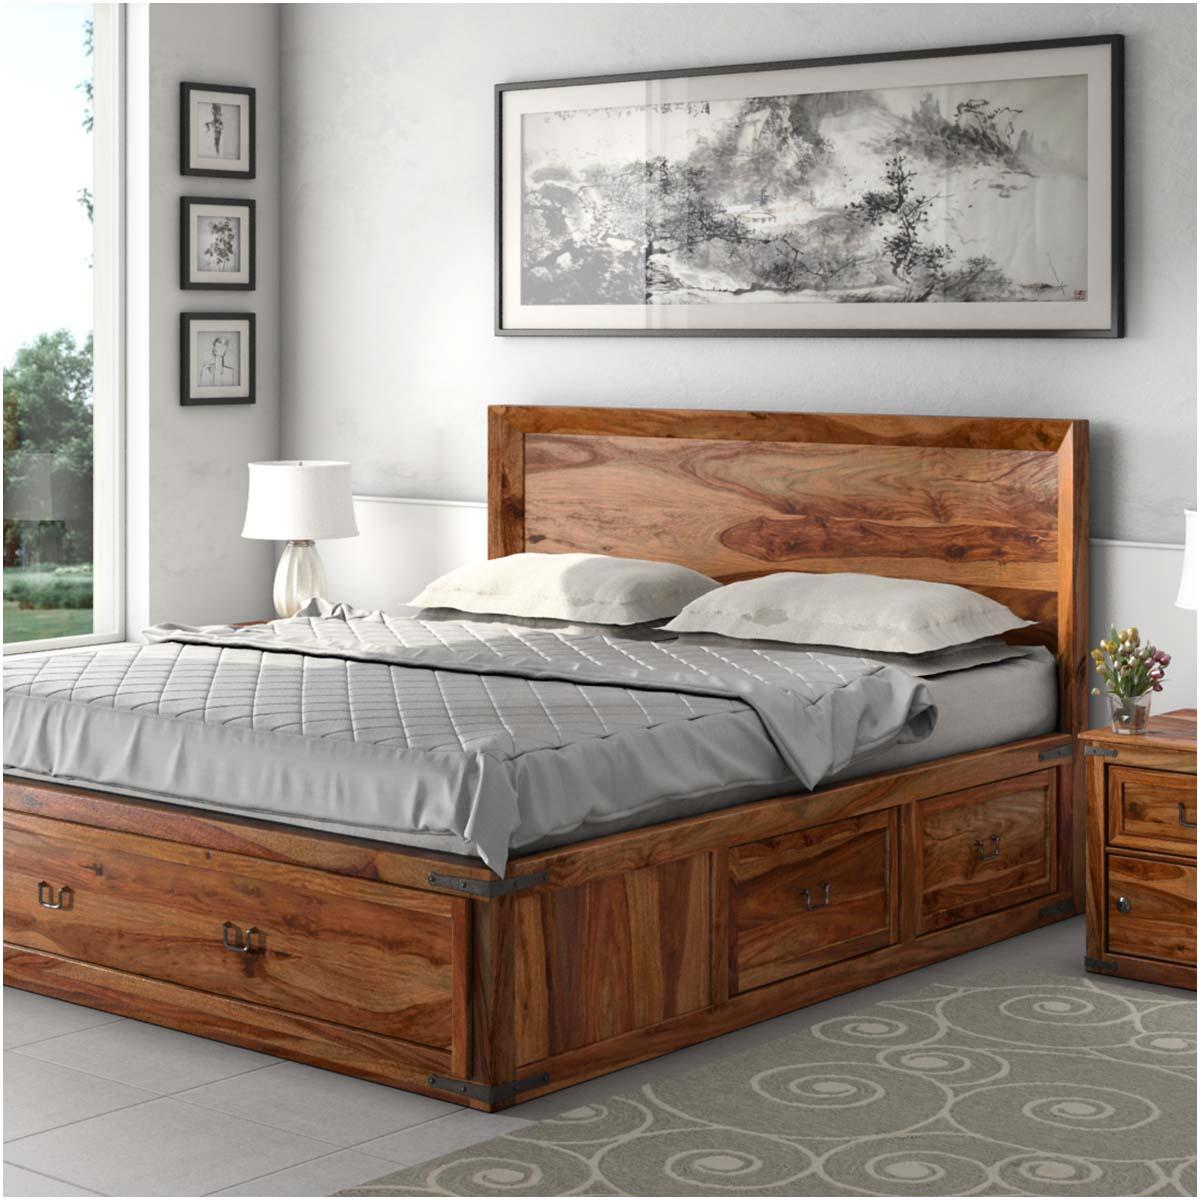 solid wood beds classic shaker solid wood storage platform captainu0027s bed GGRRFEM